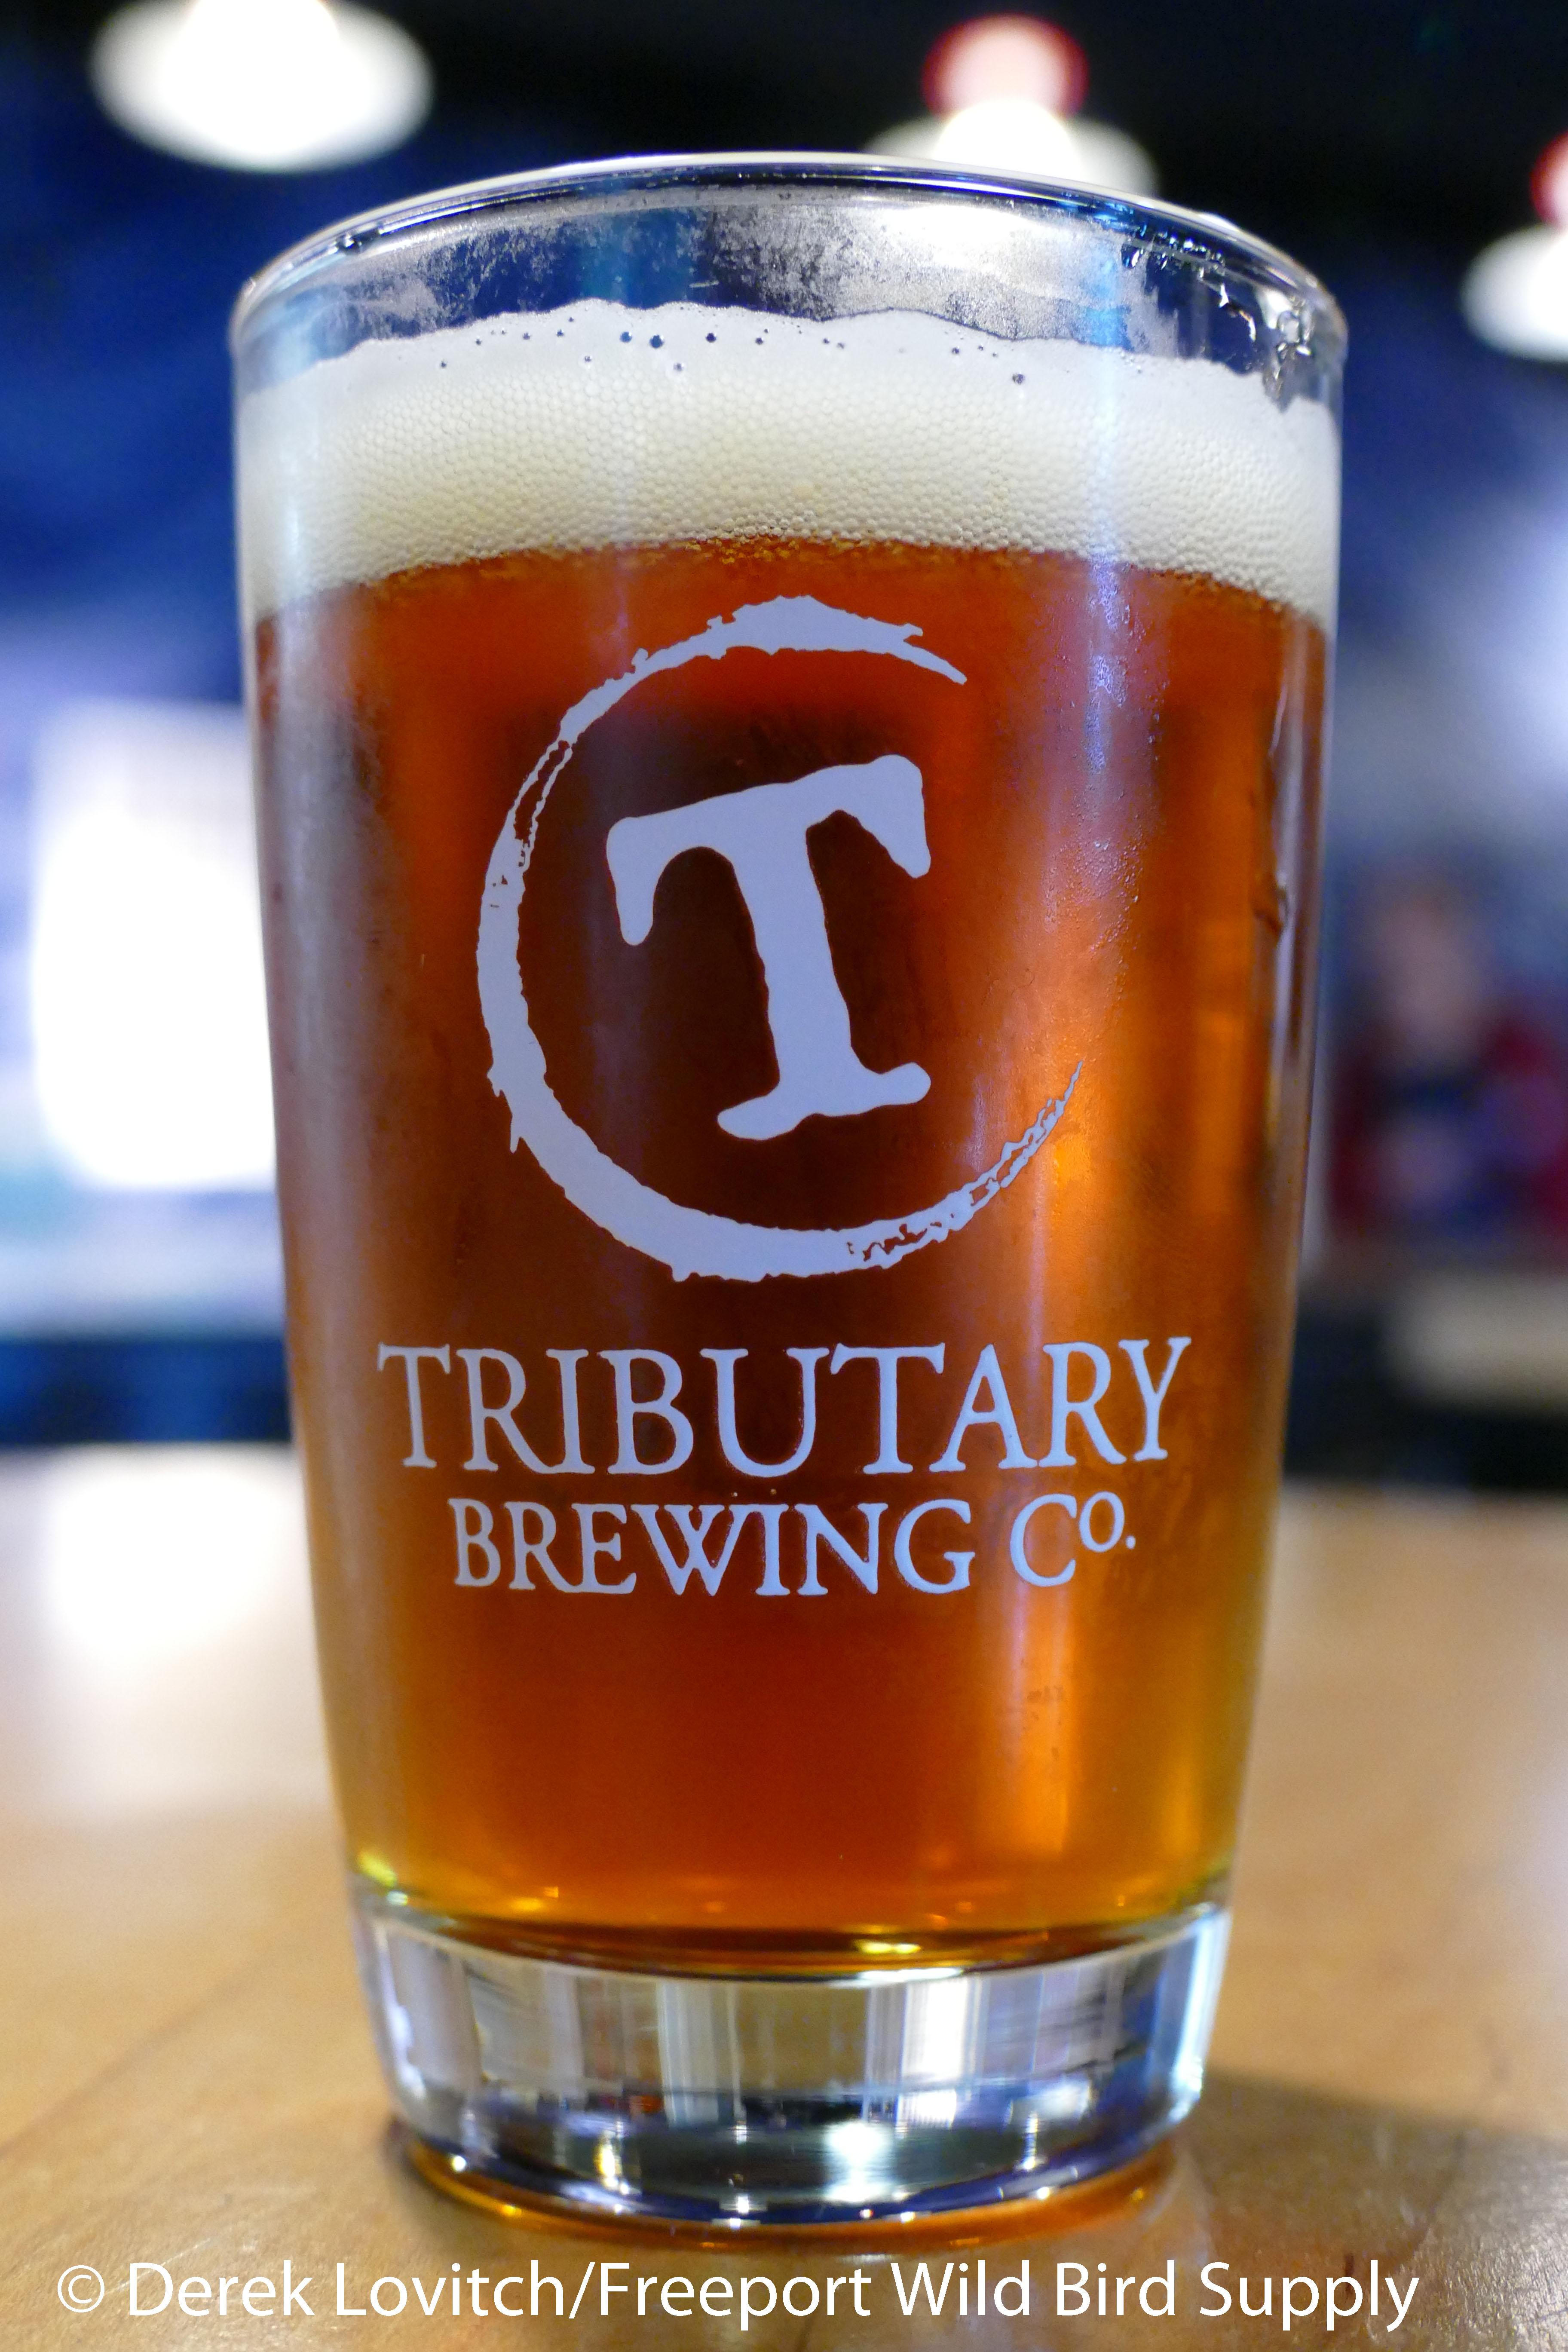 tributary_oktoberfest_glass_edited-1